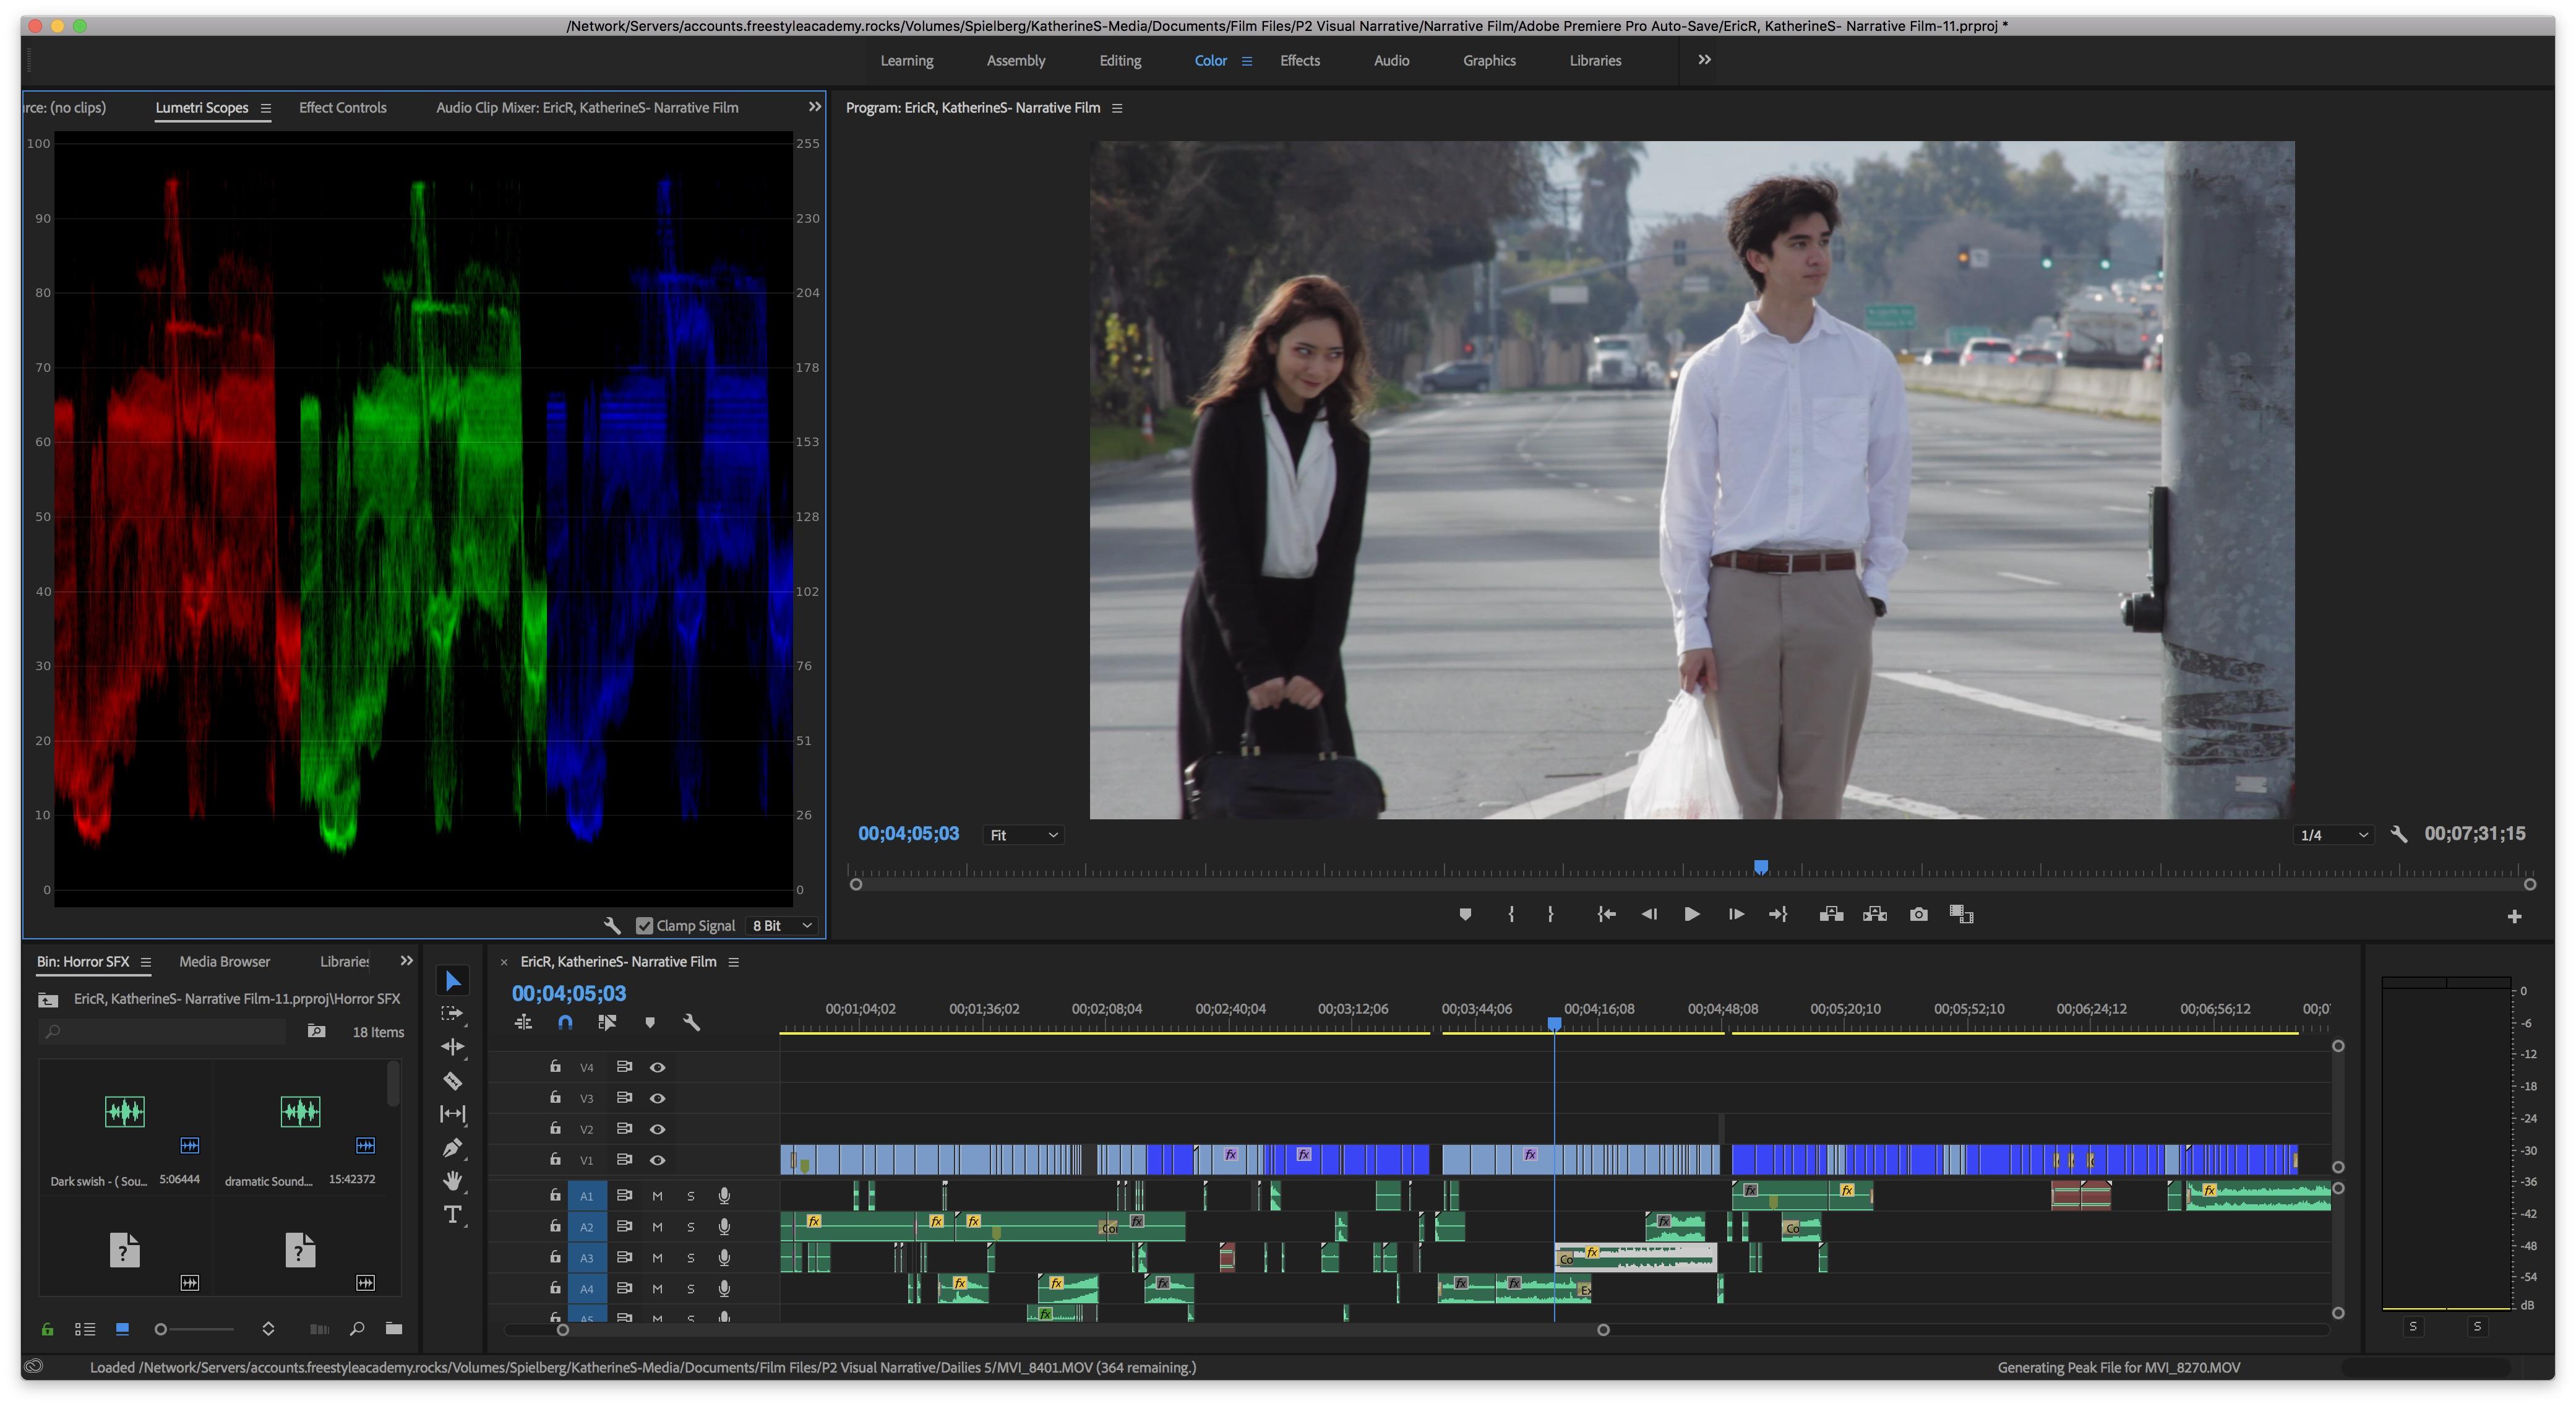 Behind the Scenes look at Adobe Premier interface.